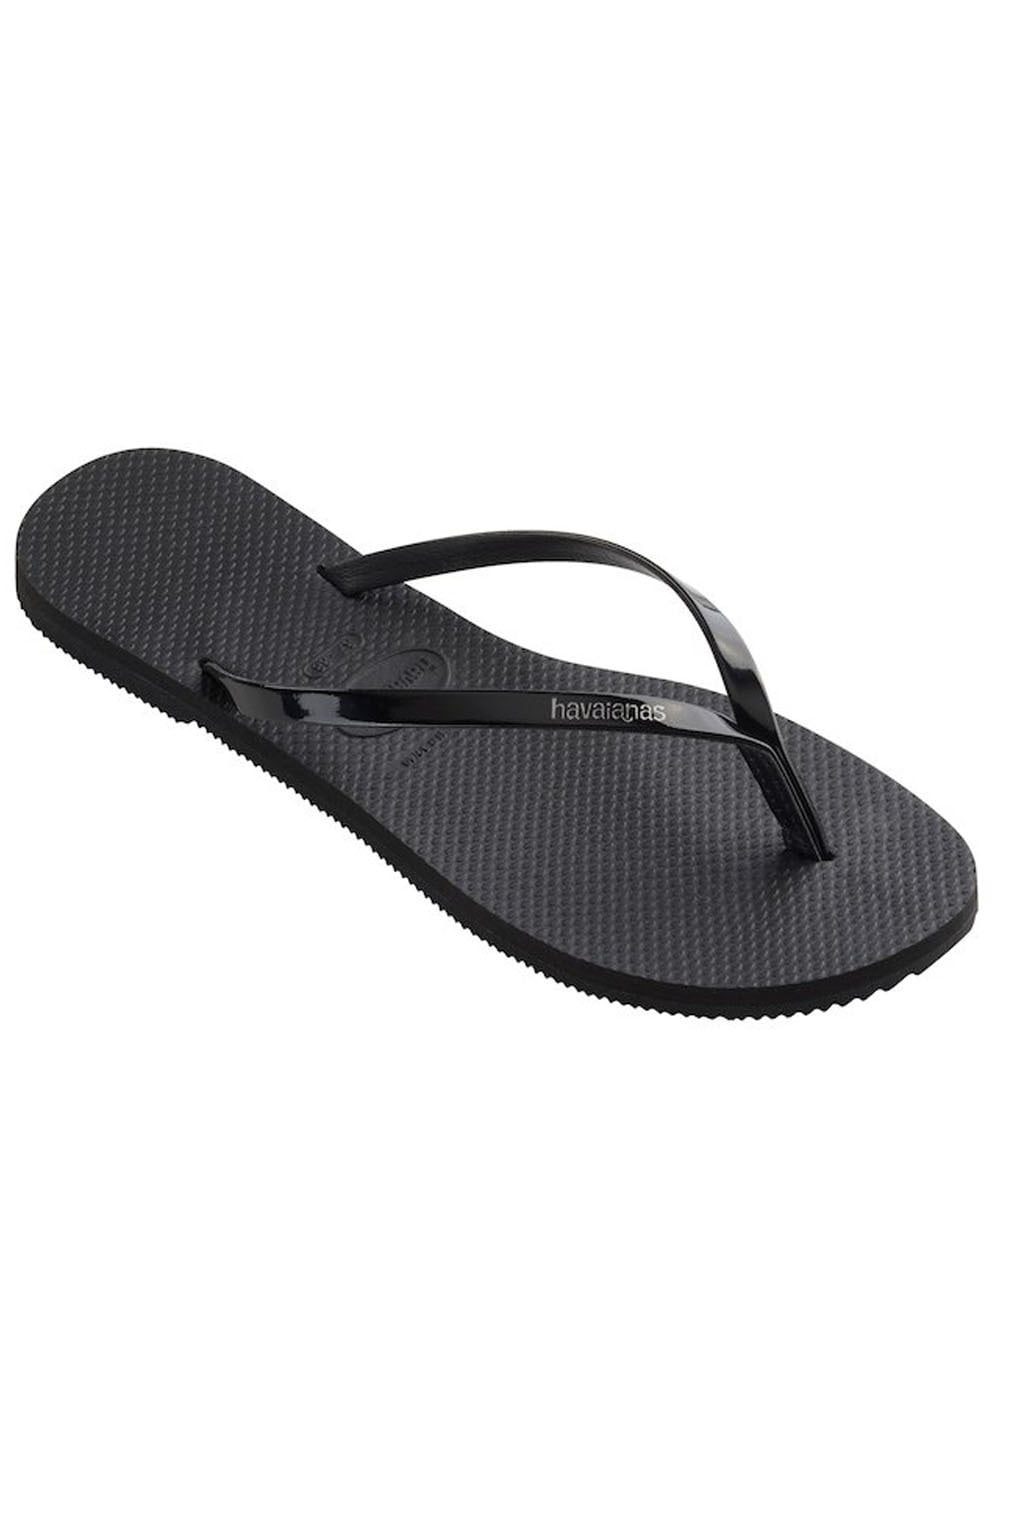 8015af3045c318 Havaianas you metallic slippers zwart koop je online… | Kellyjeans.nl